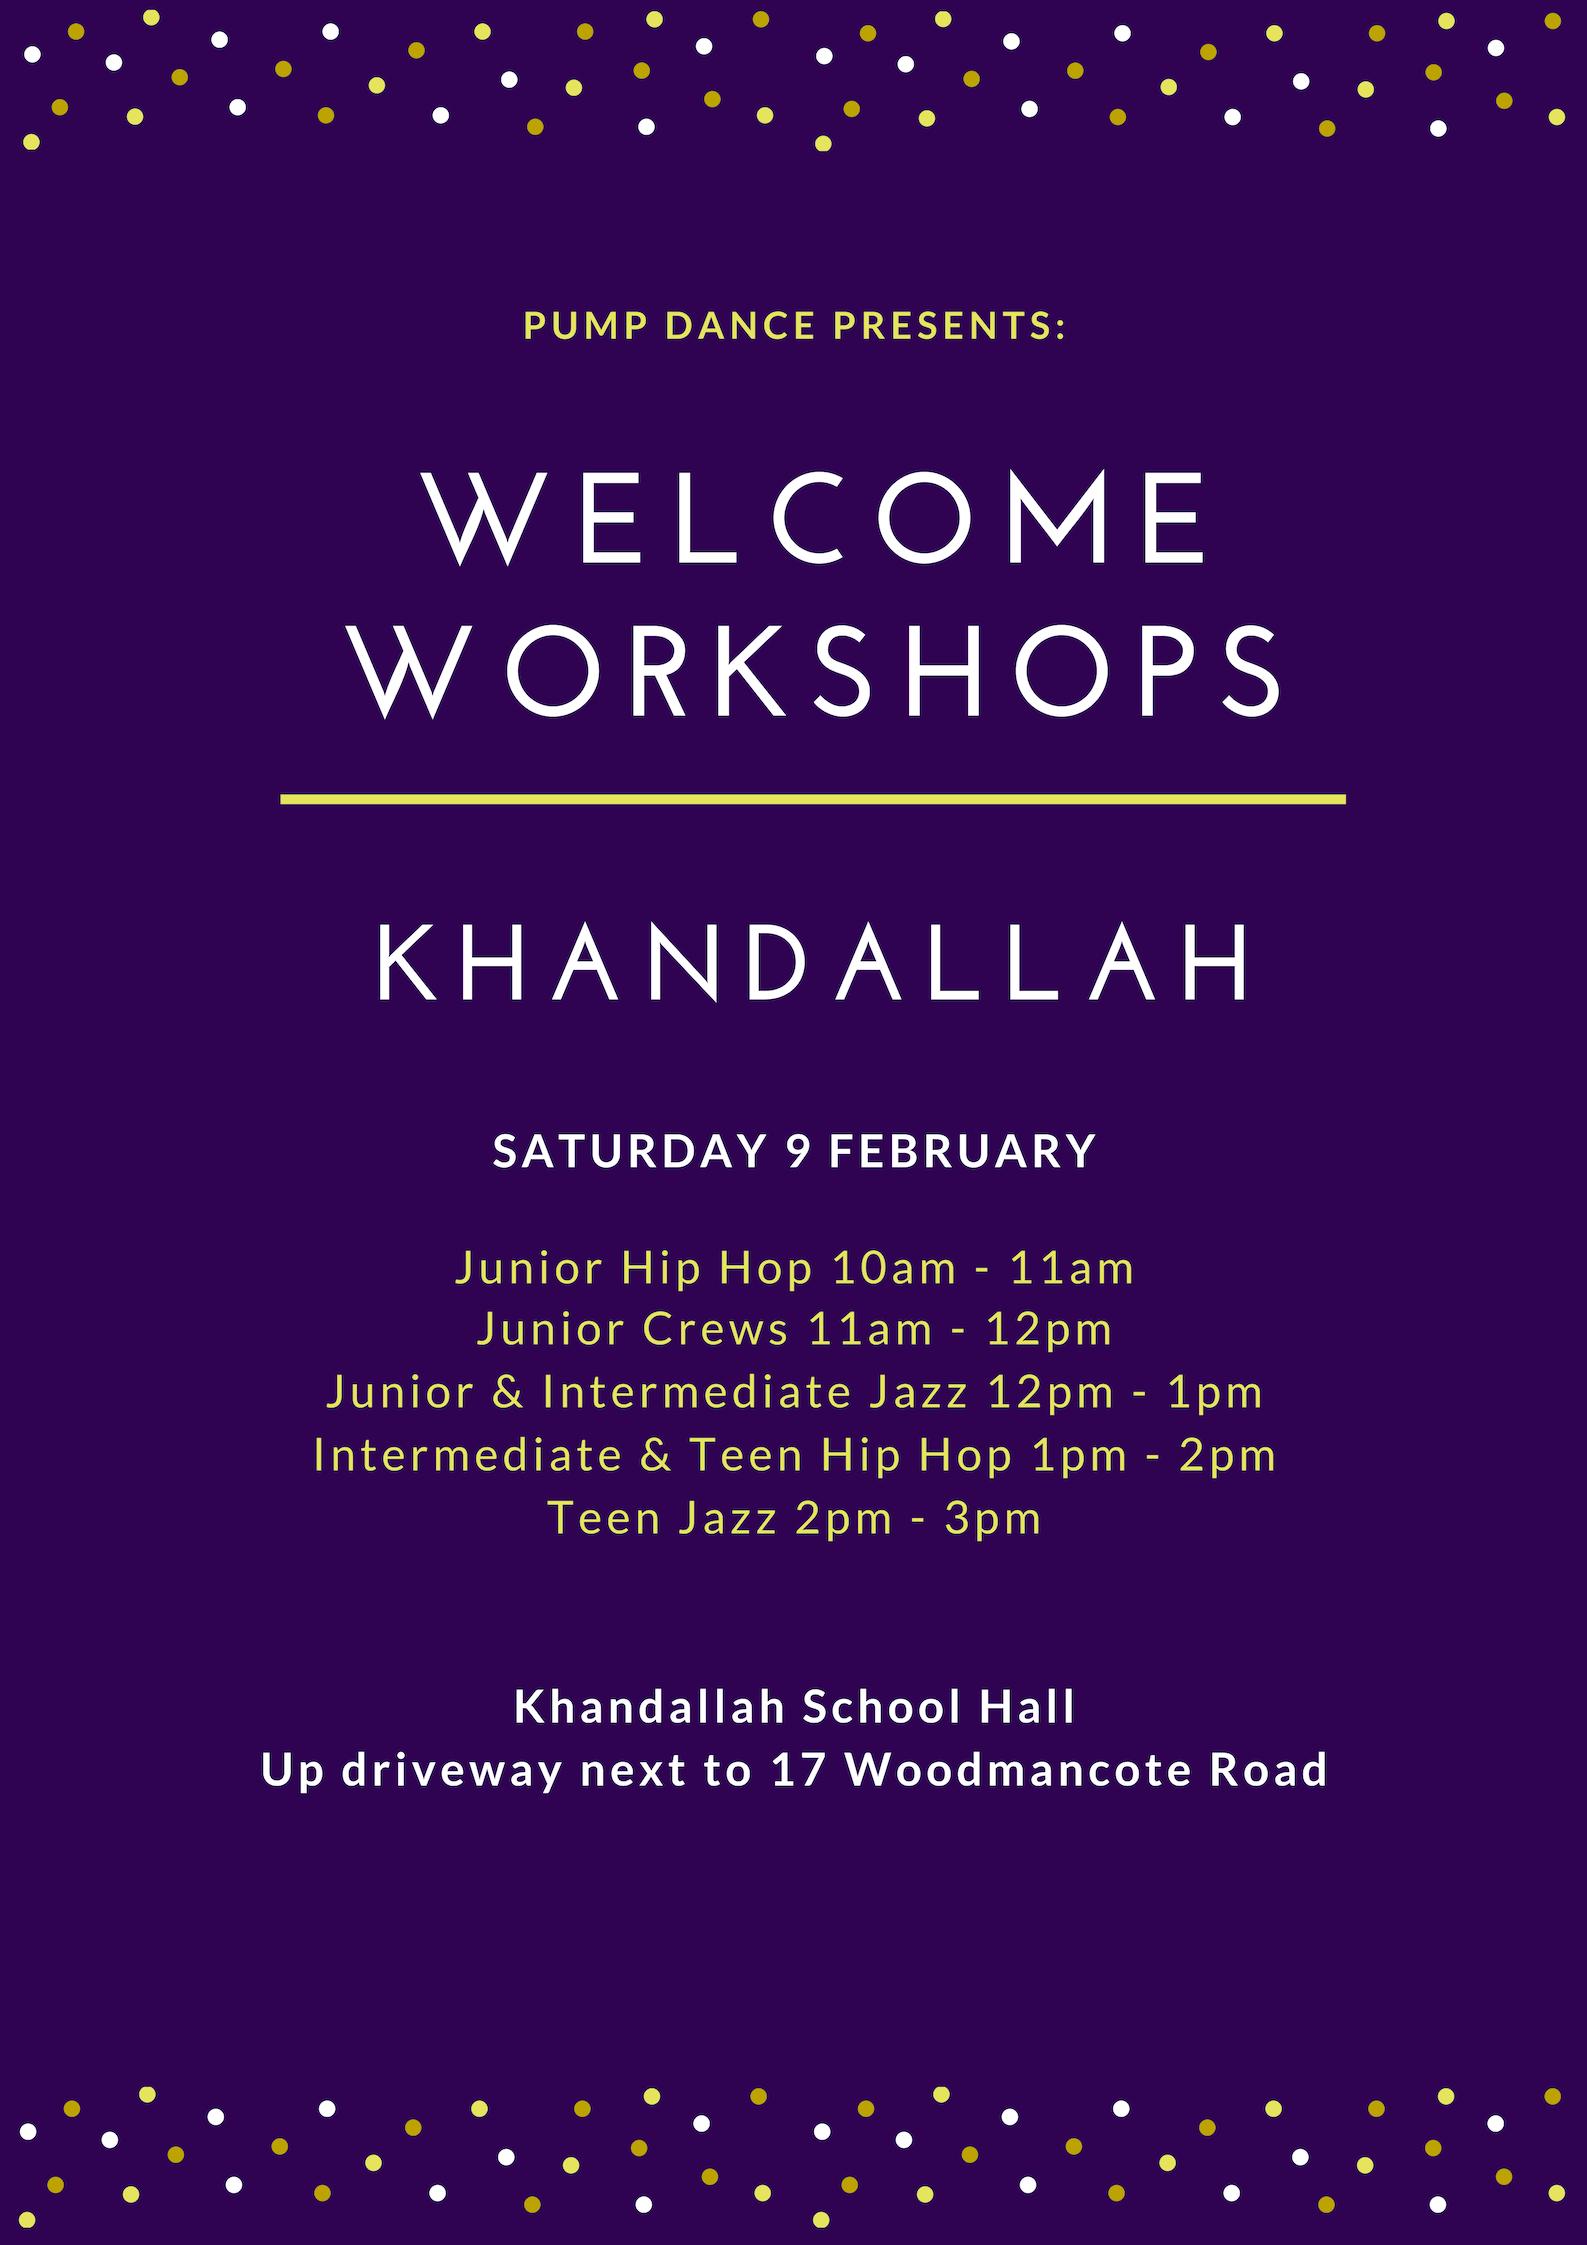 Pump Dance Khandallah Welcome Workshops 2019